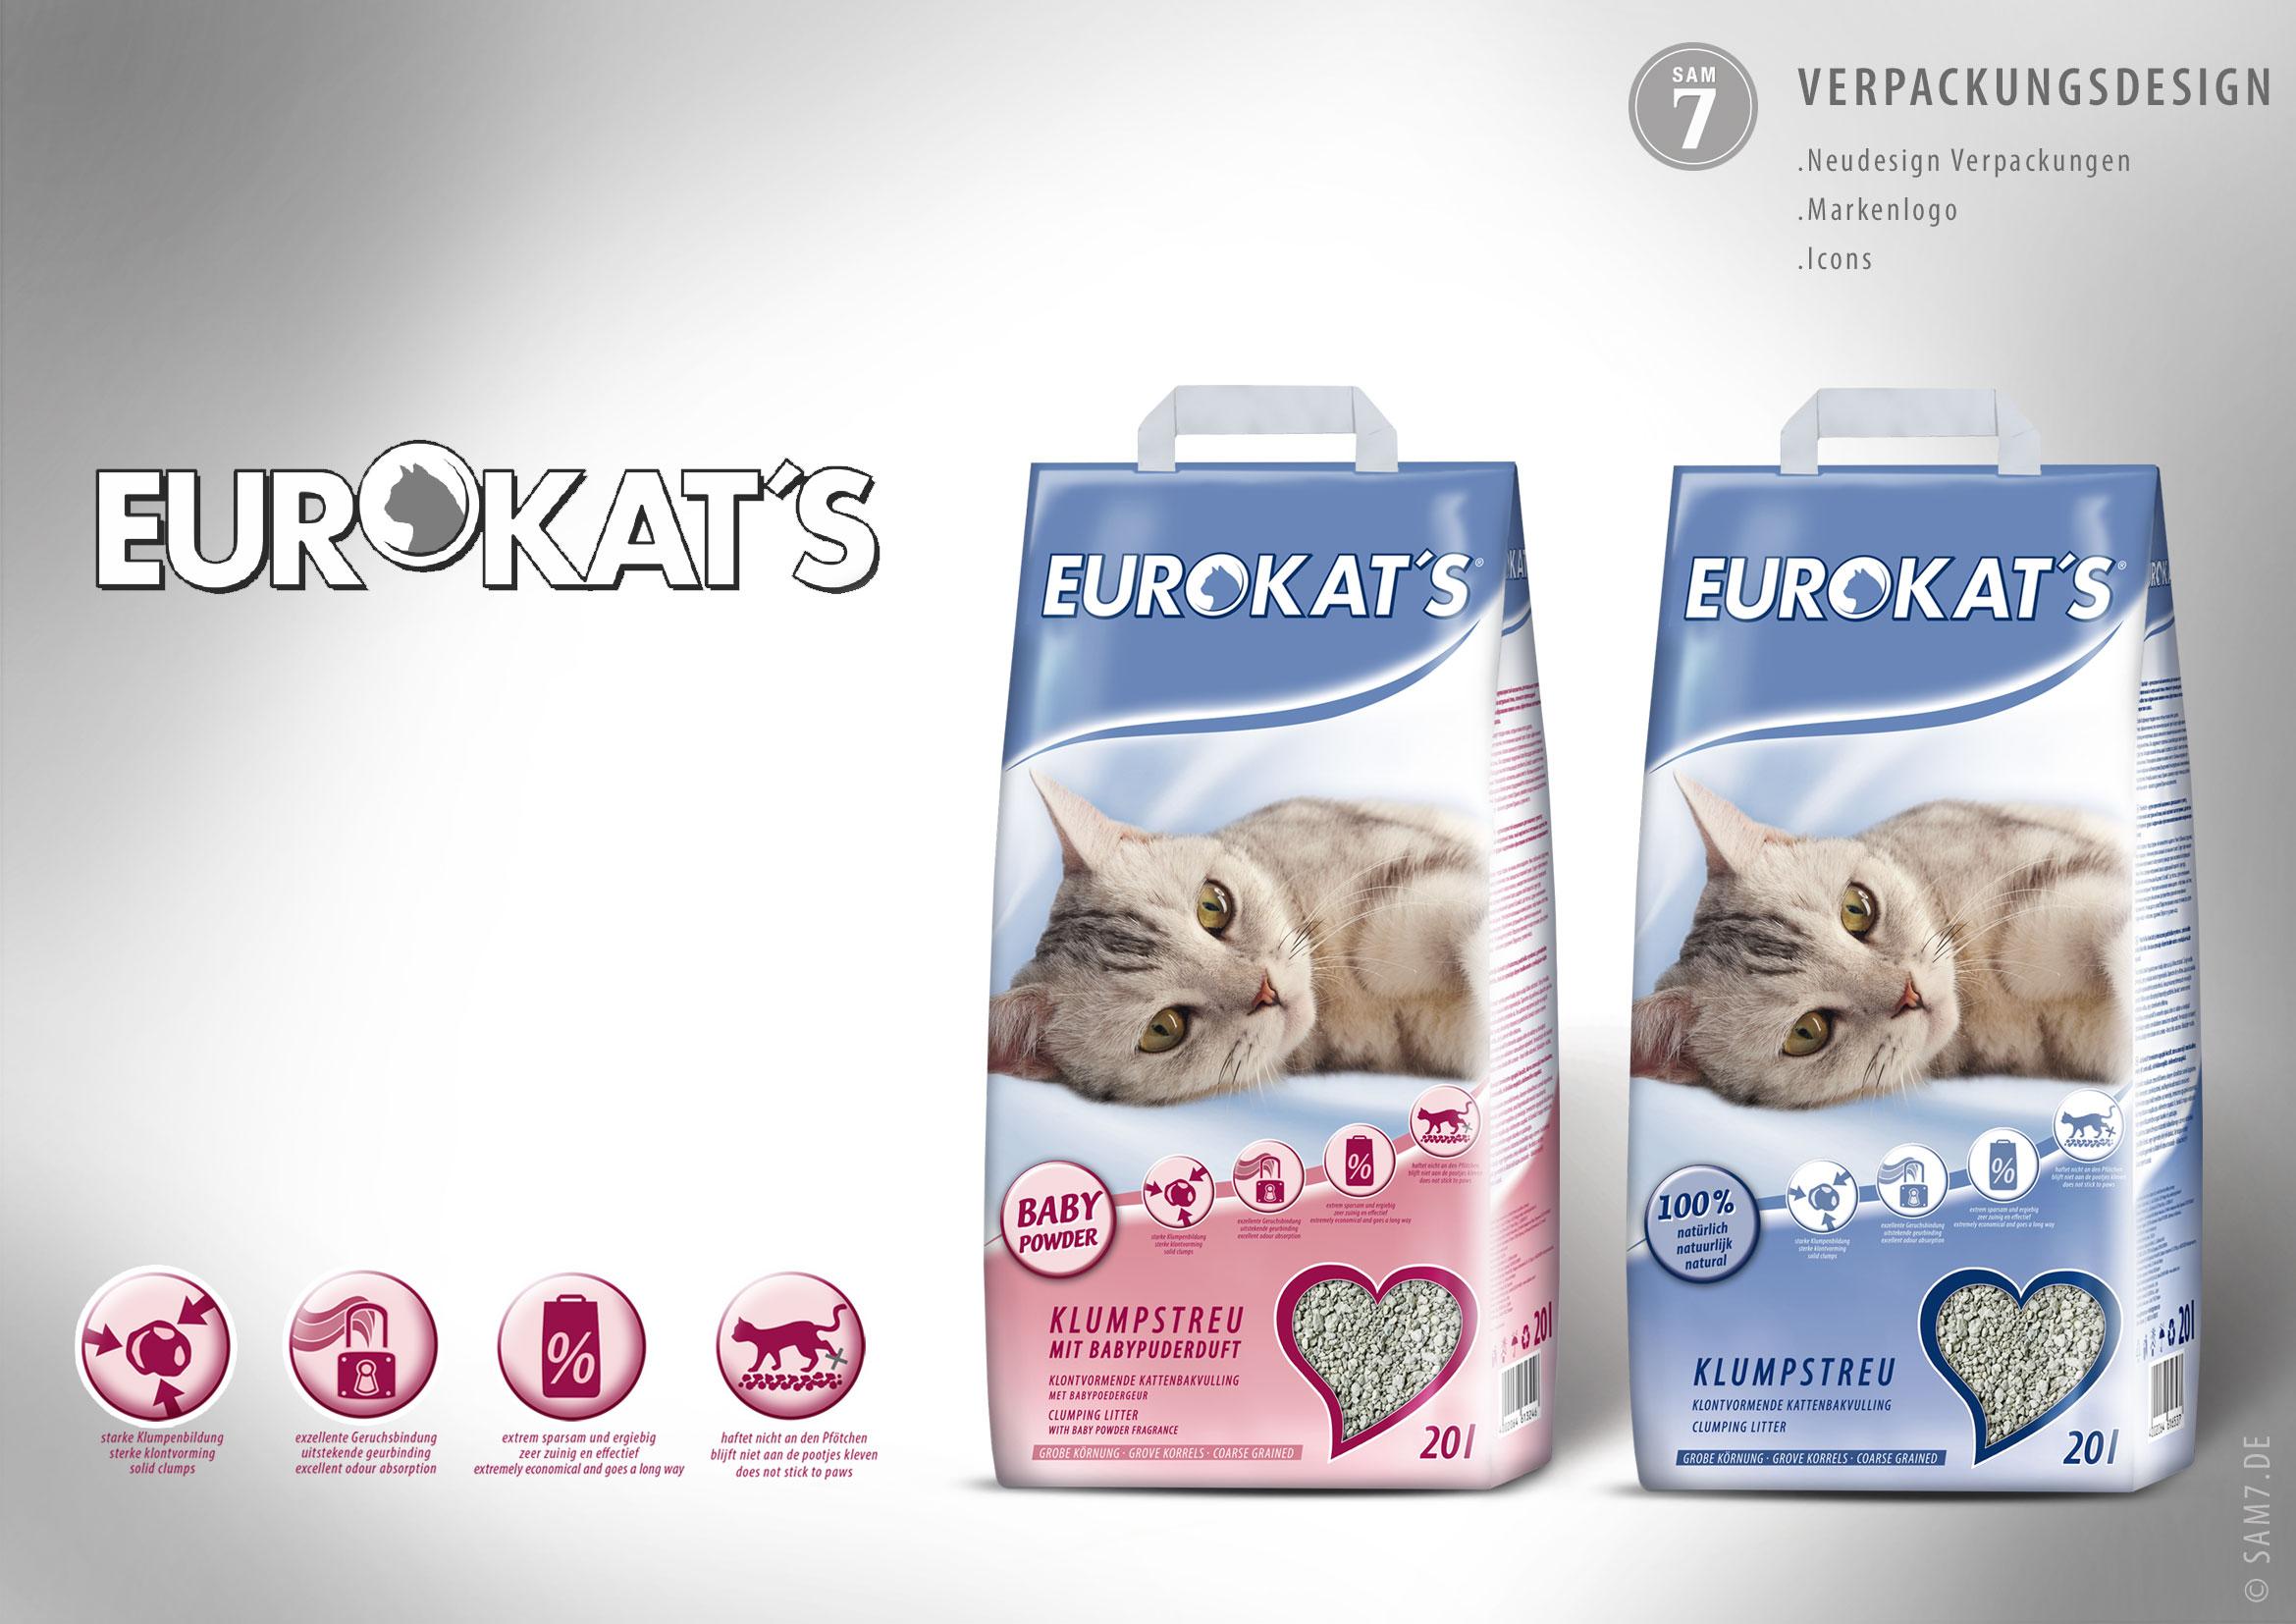 Verpackungsdesign Eurokats.